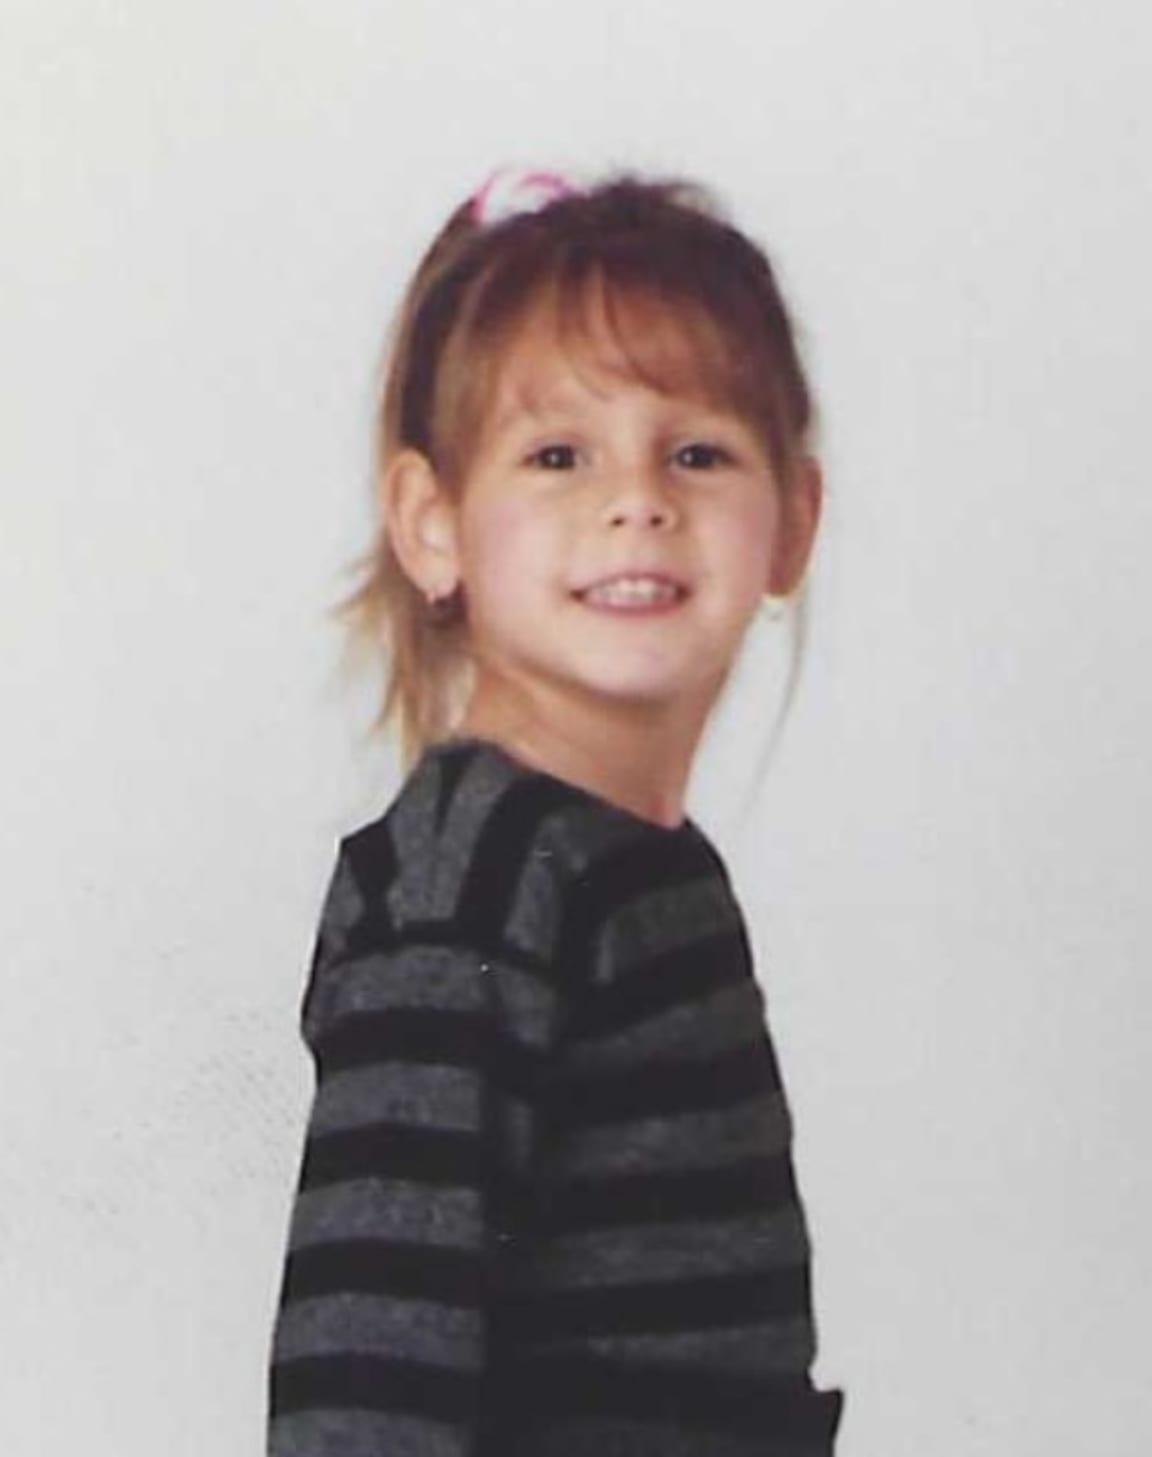 Lindsay as a kid